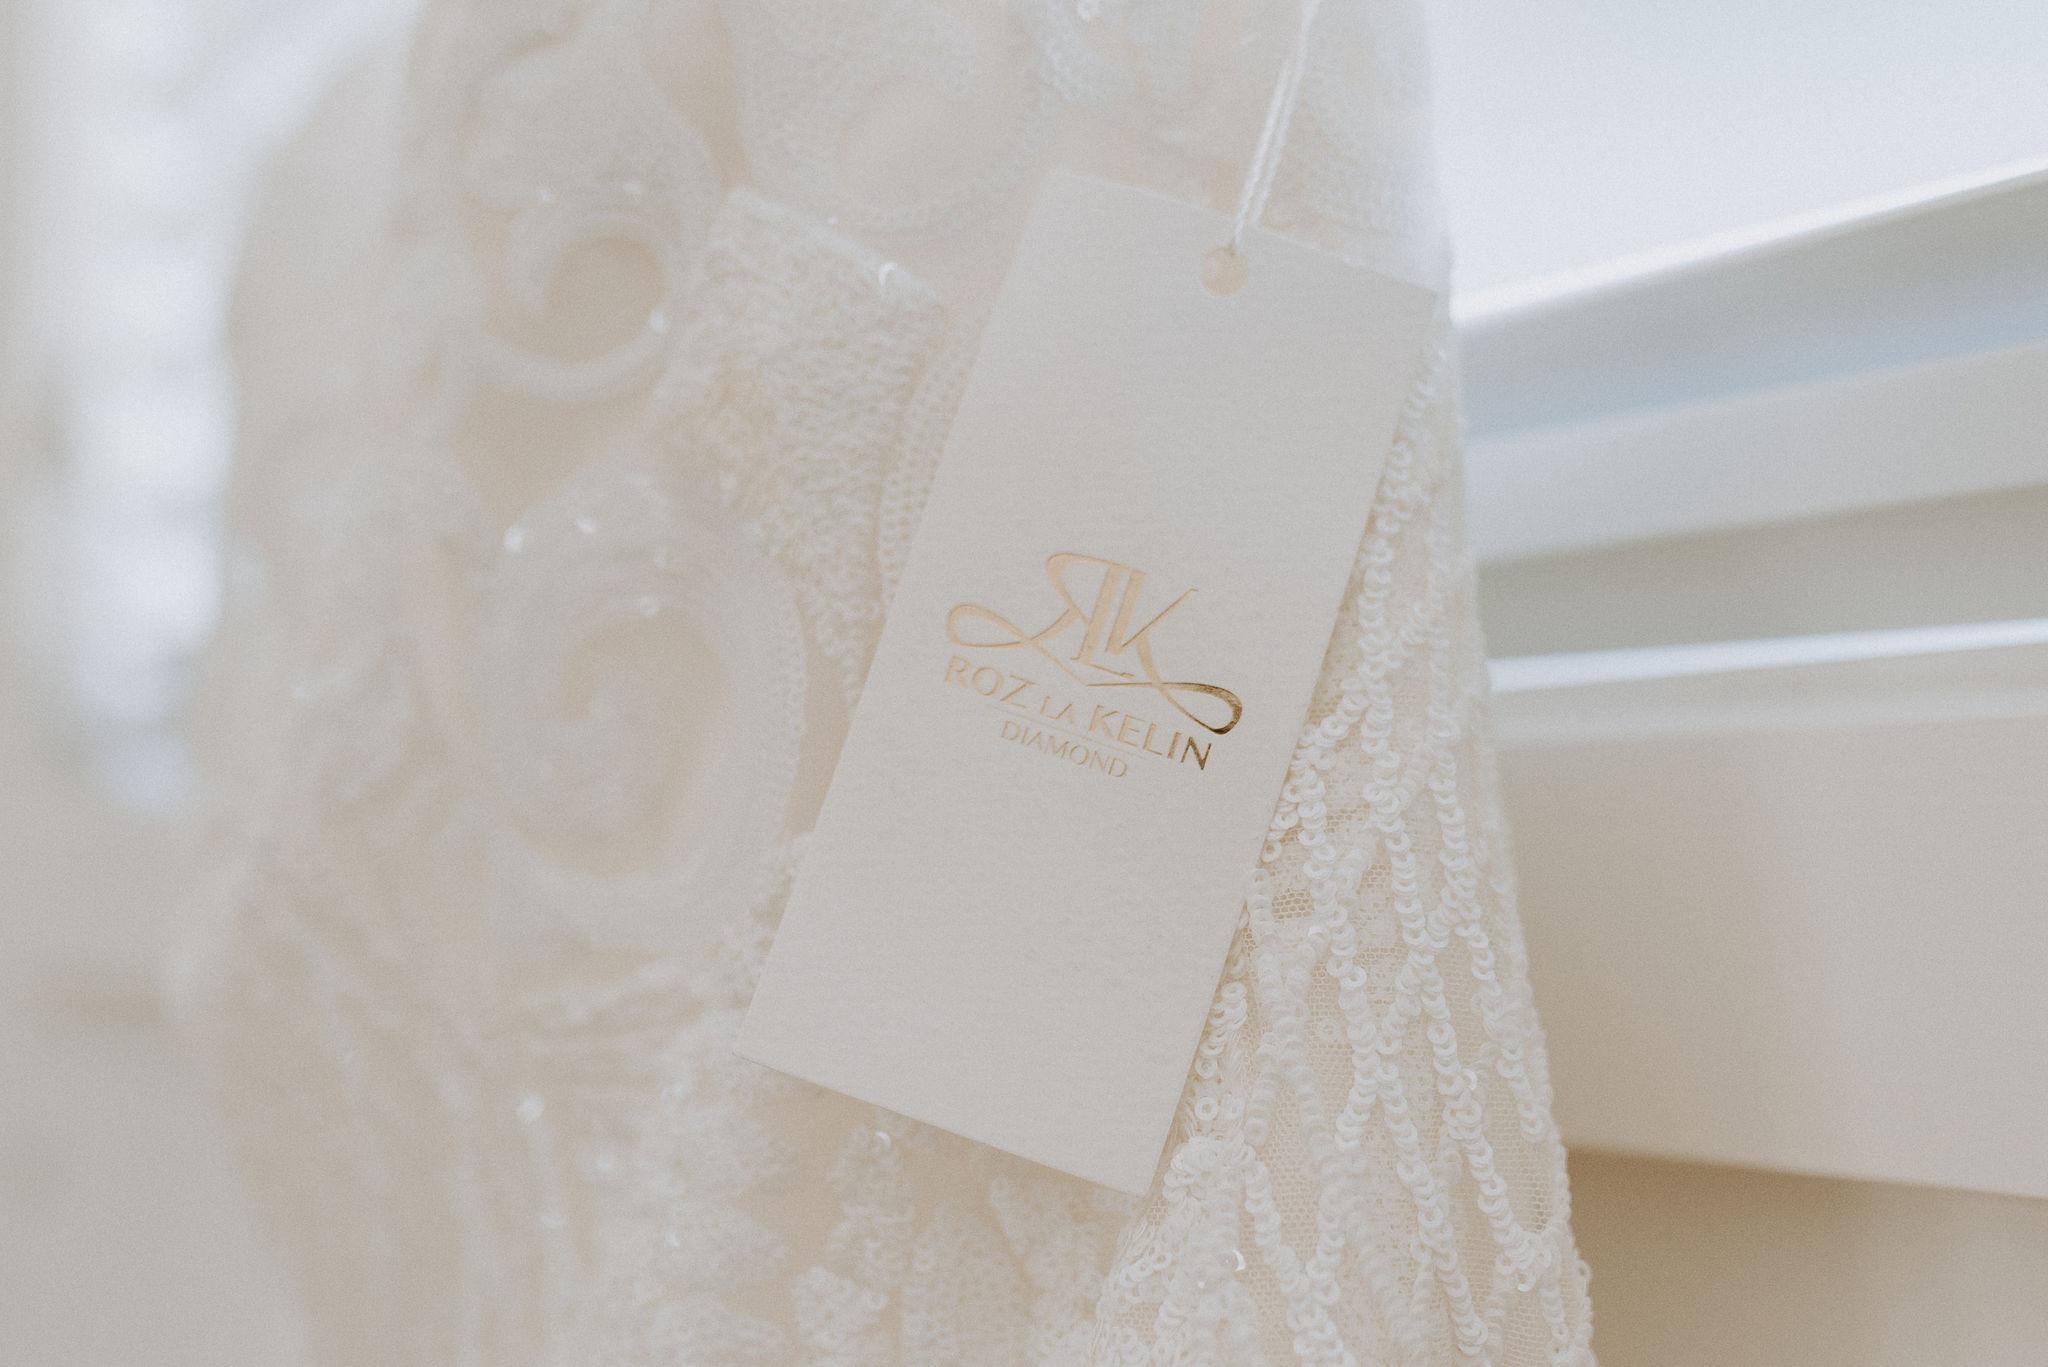 CAVES-BEACH-HOTEL-WEDDING-PATTEN-49.jpg